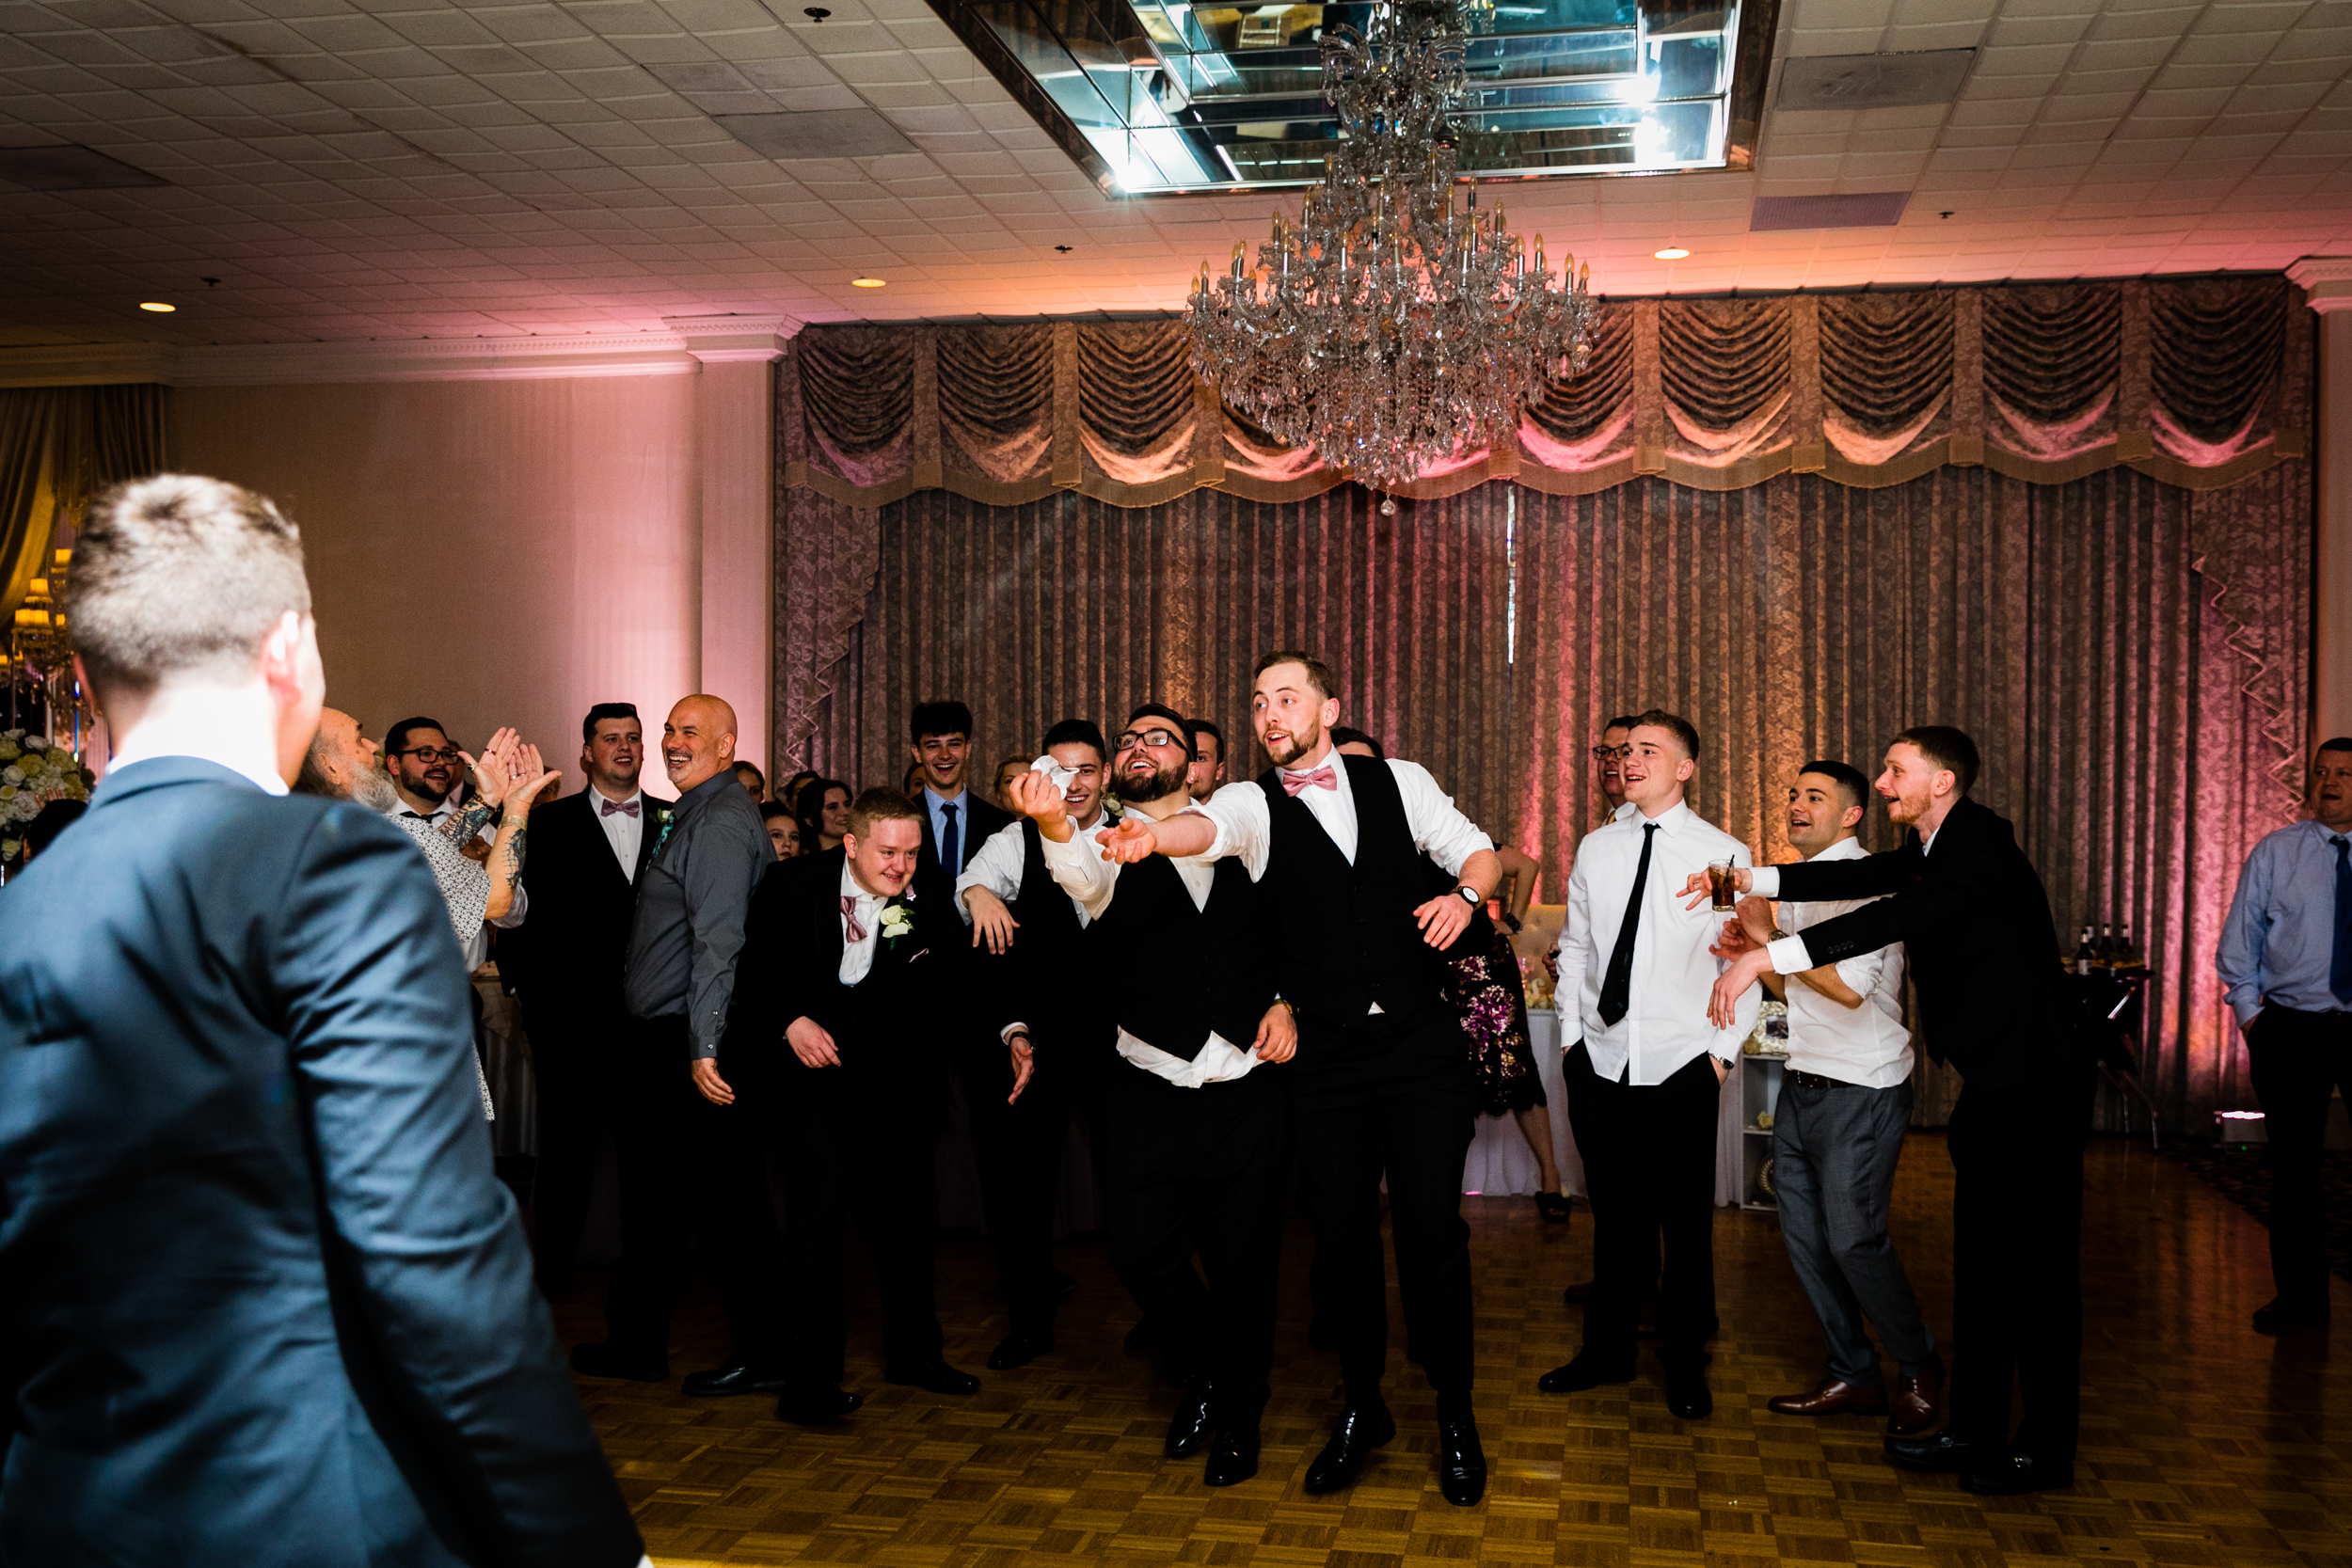 CELEBRATIONS BENSALEM WEDDING PHOTOGRAPHY-116.jpg